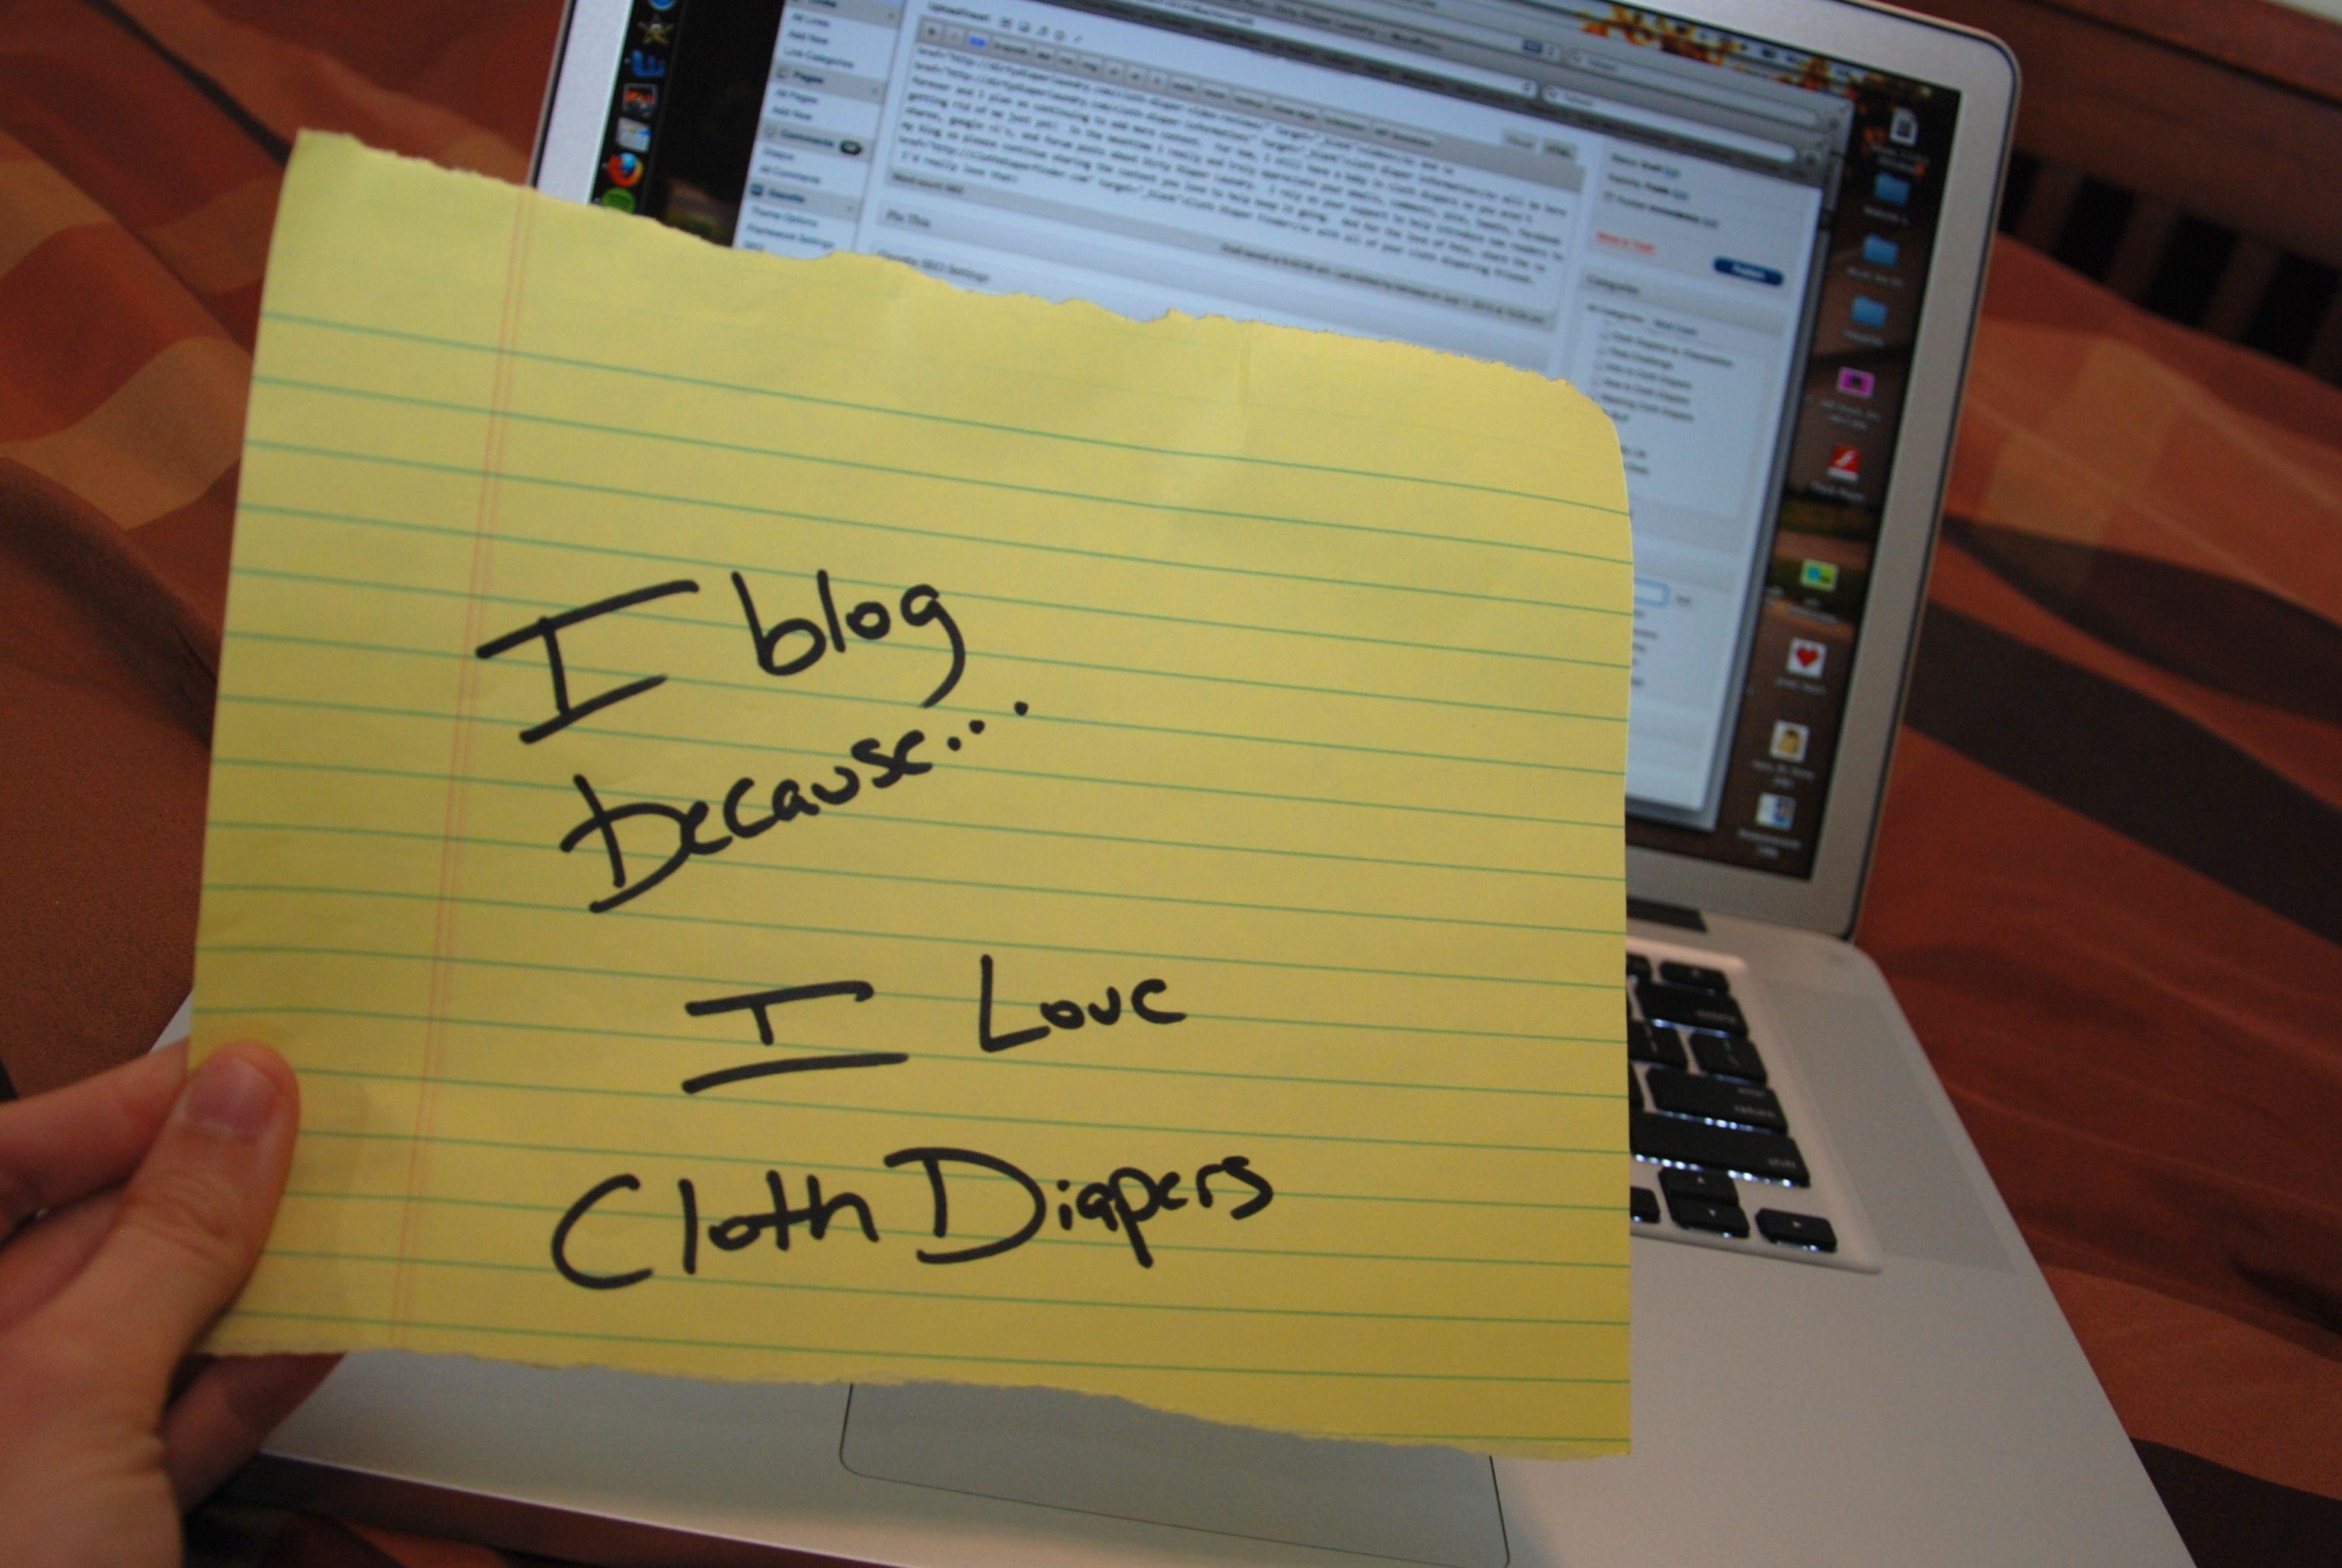 I blog because I love cloth diapers